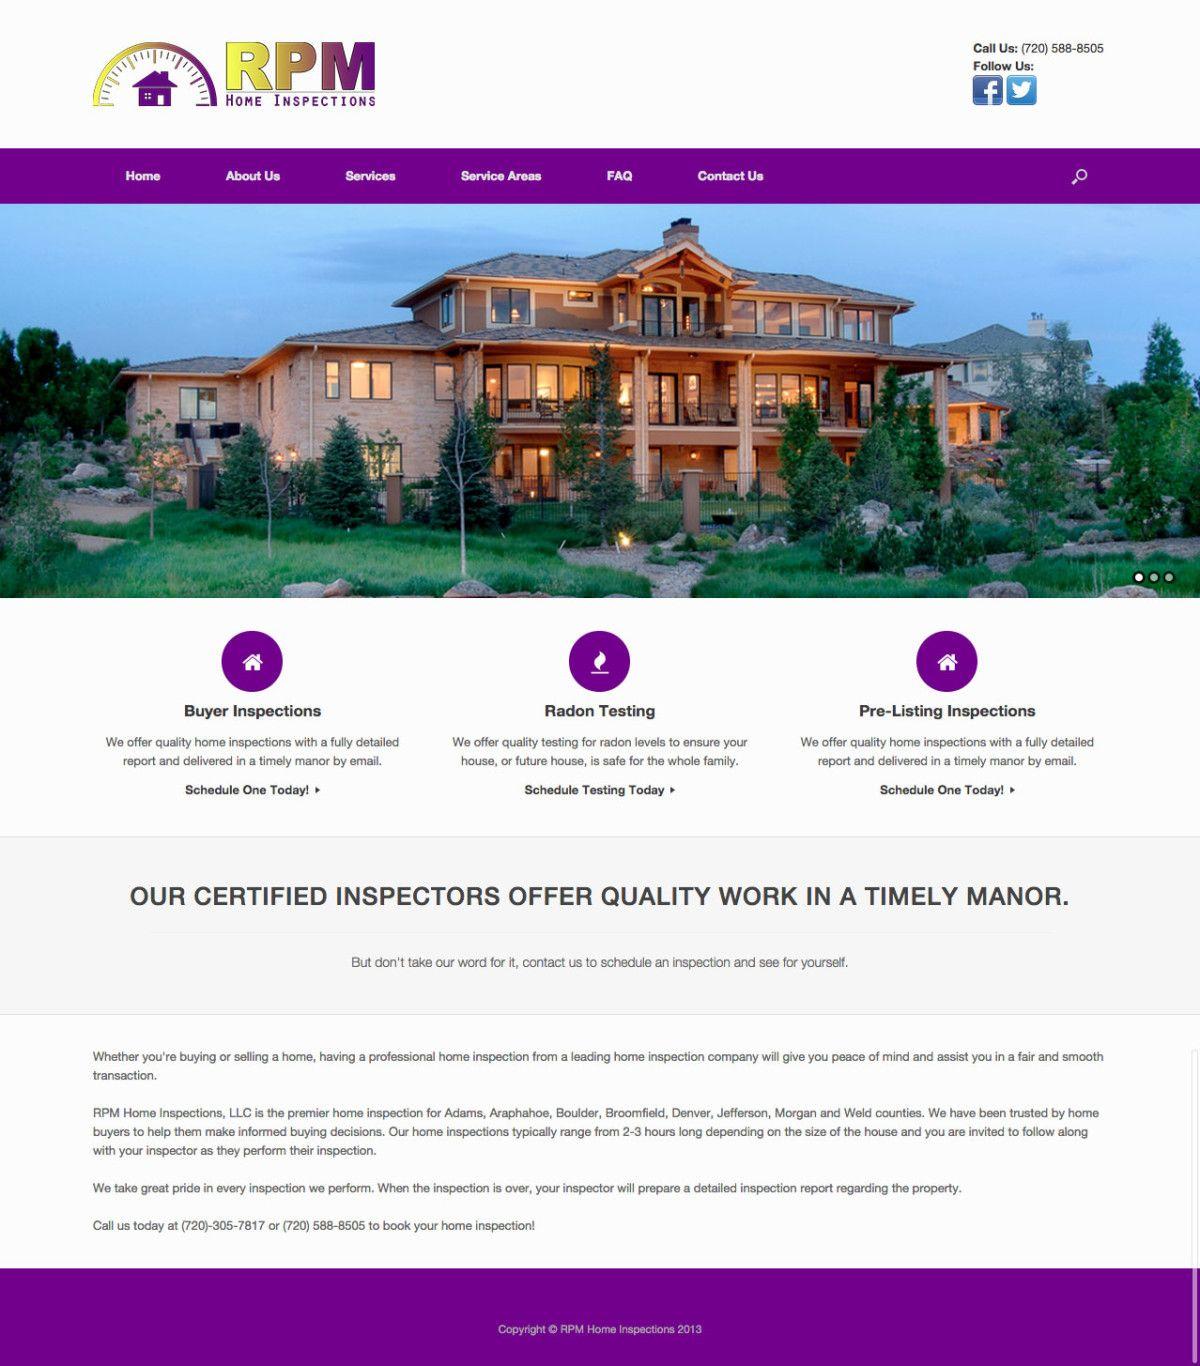 RPM Home Inspections Website Design | Website Design | Pinterest ...